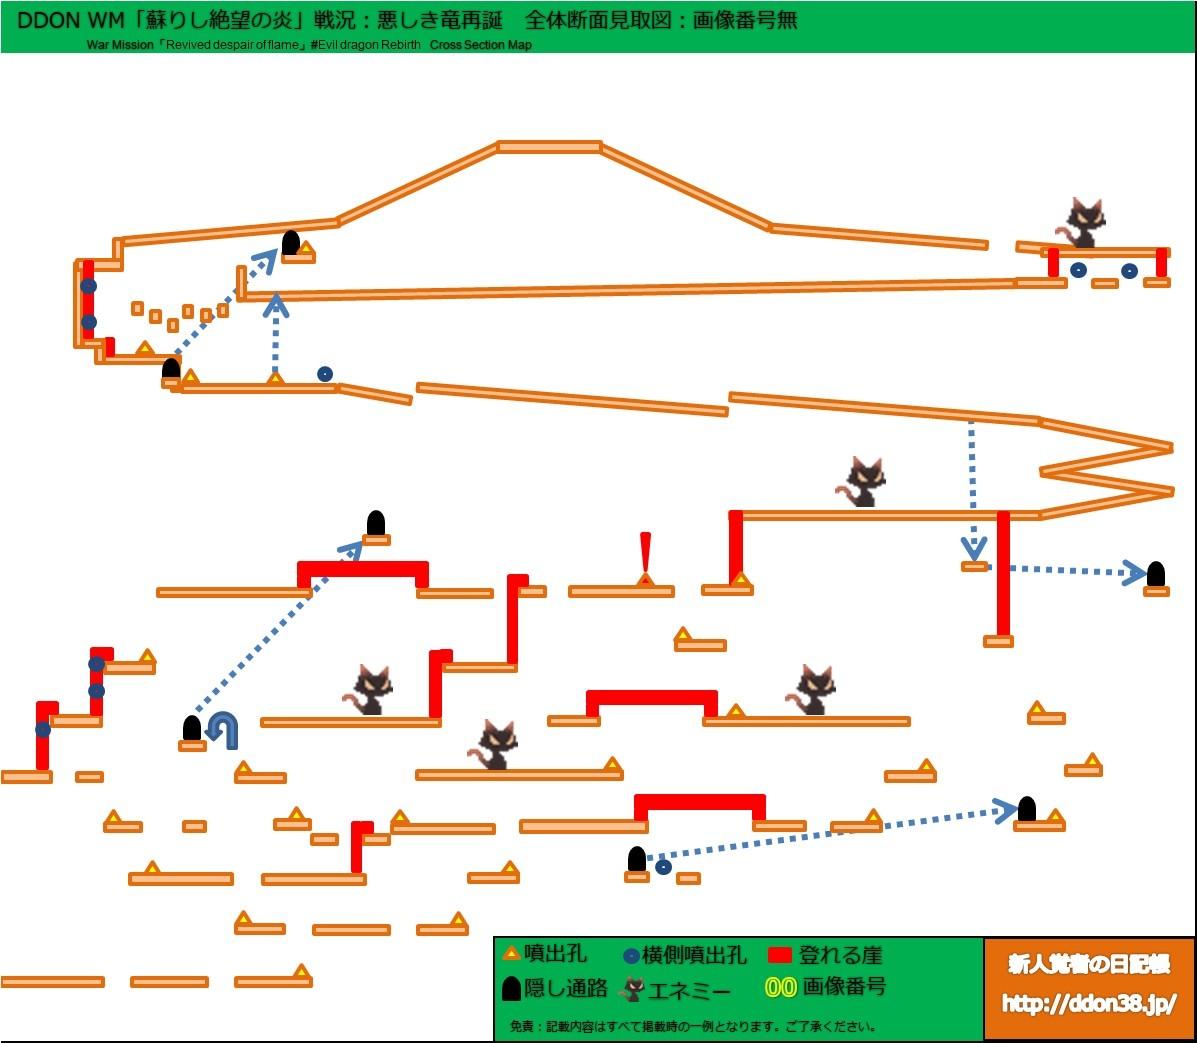 WM_Evil_Dragon_Rebirth_cross_section_map.jpg